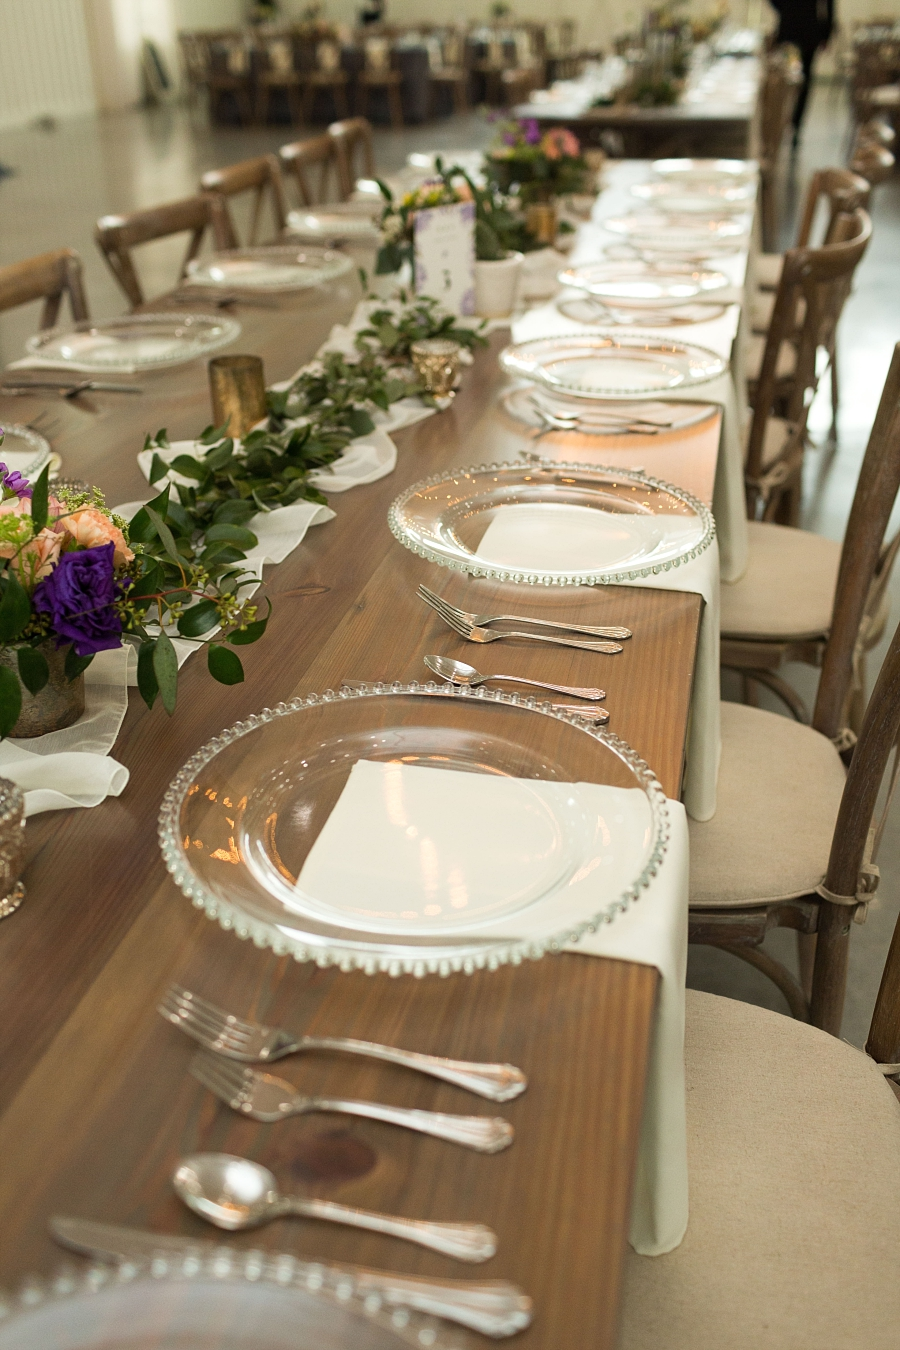 Stacy-Anderson-Photography-The-Farmhouse-Houston-Wedding-Photographer_0077.jpg